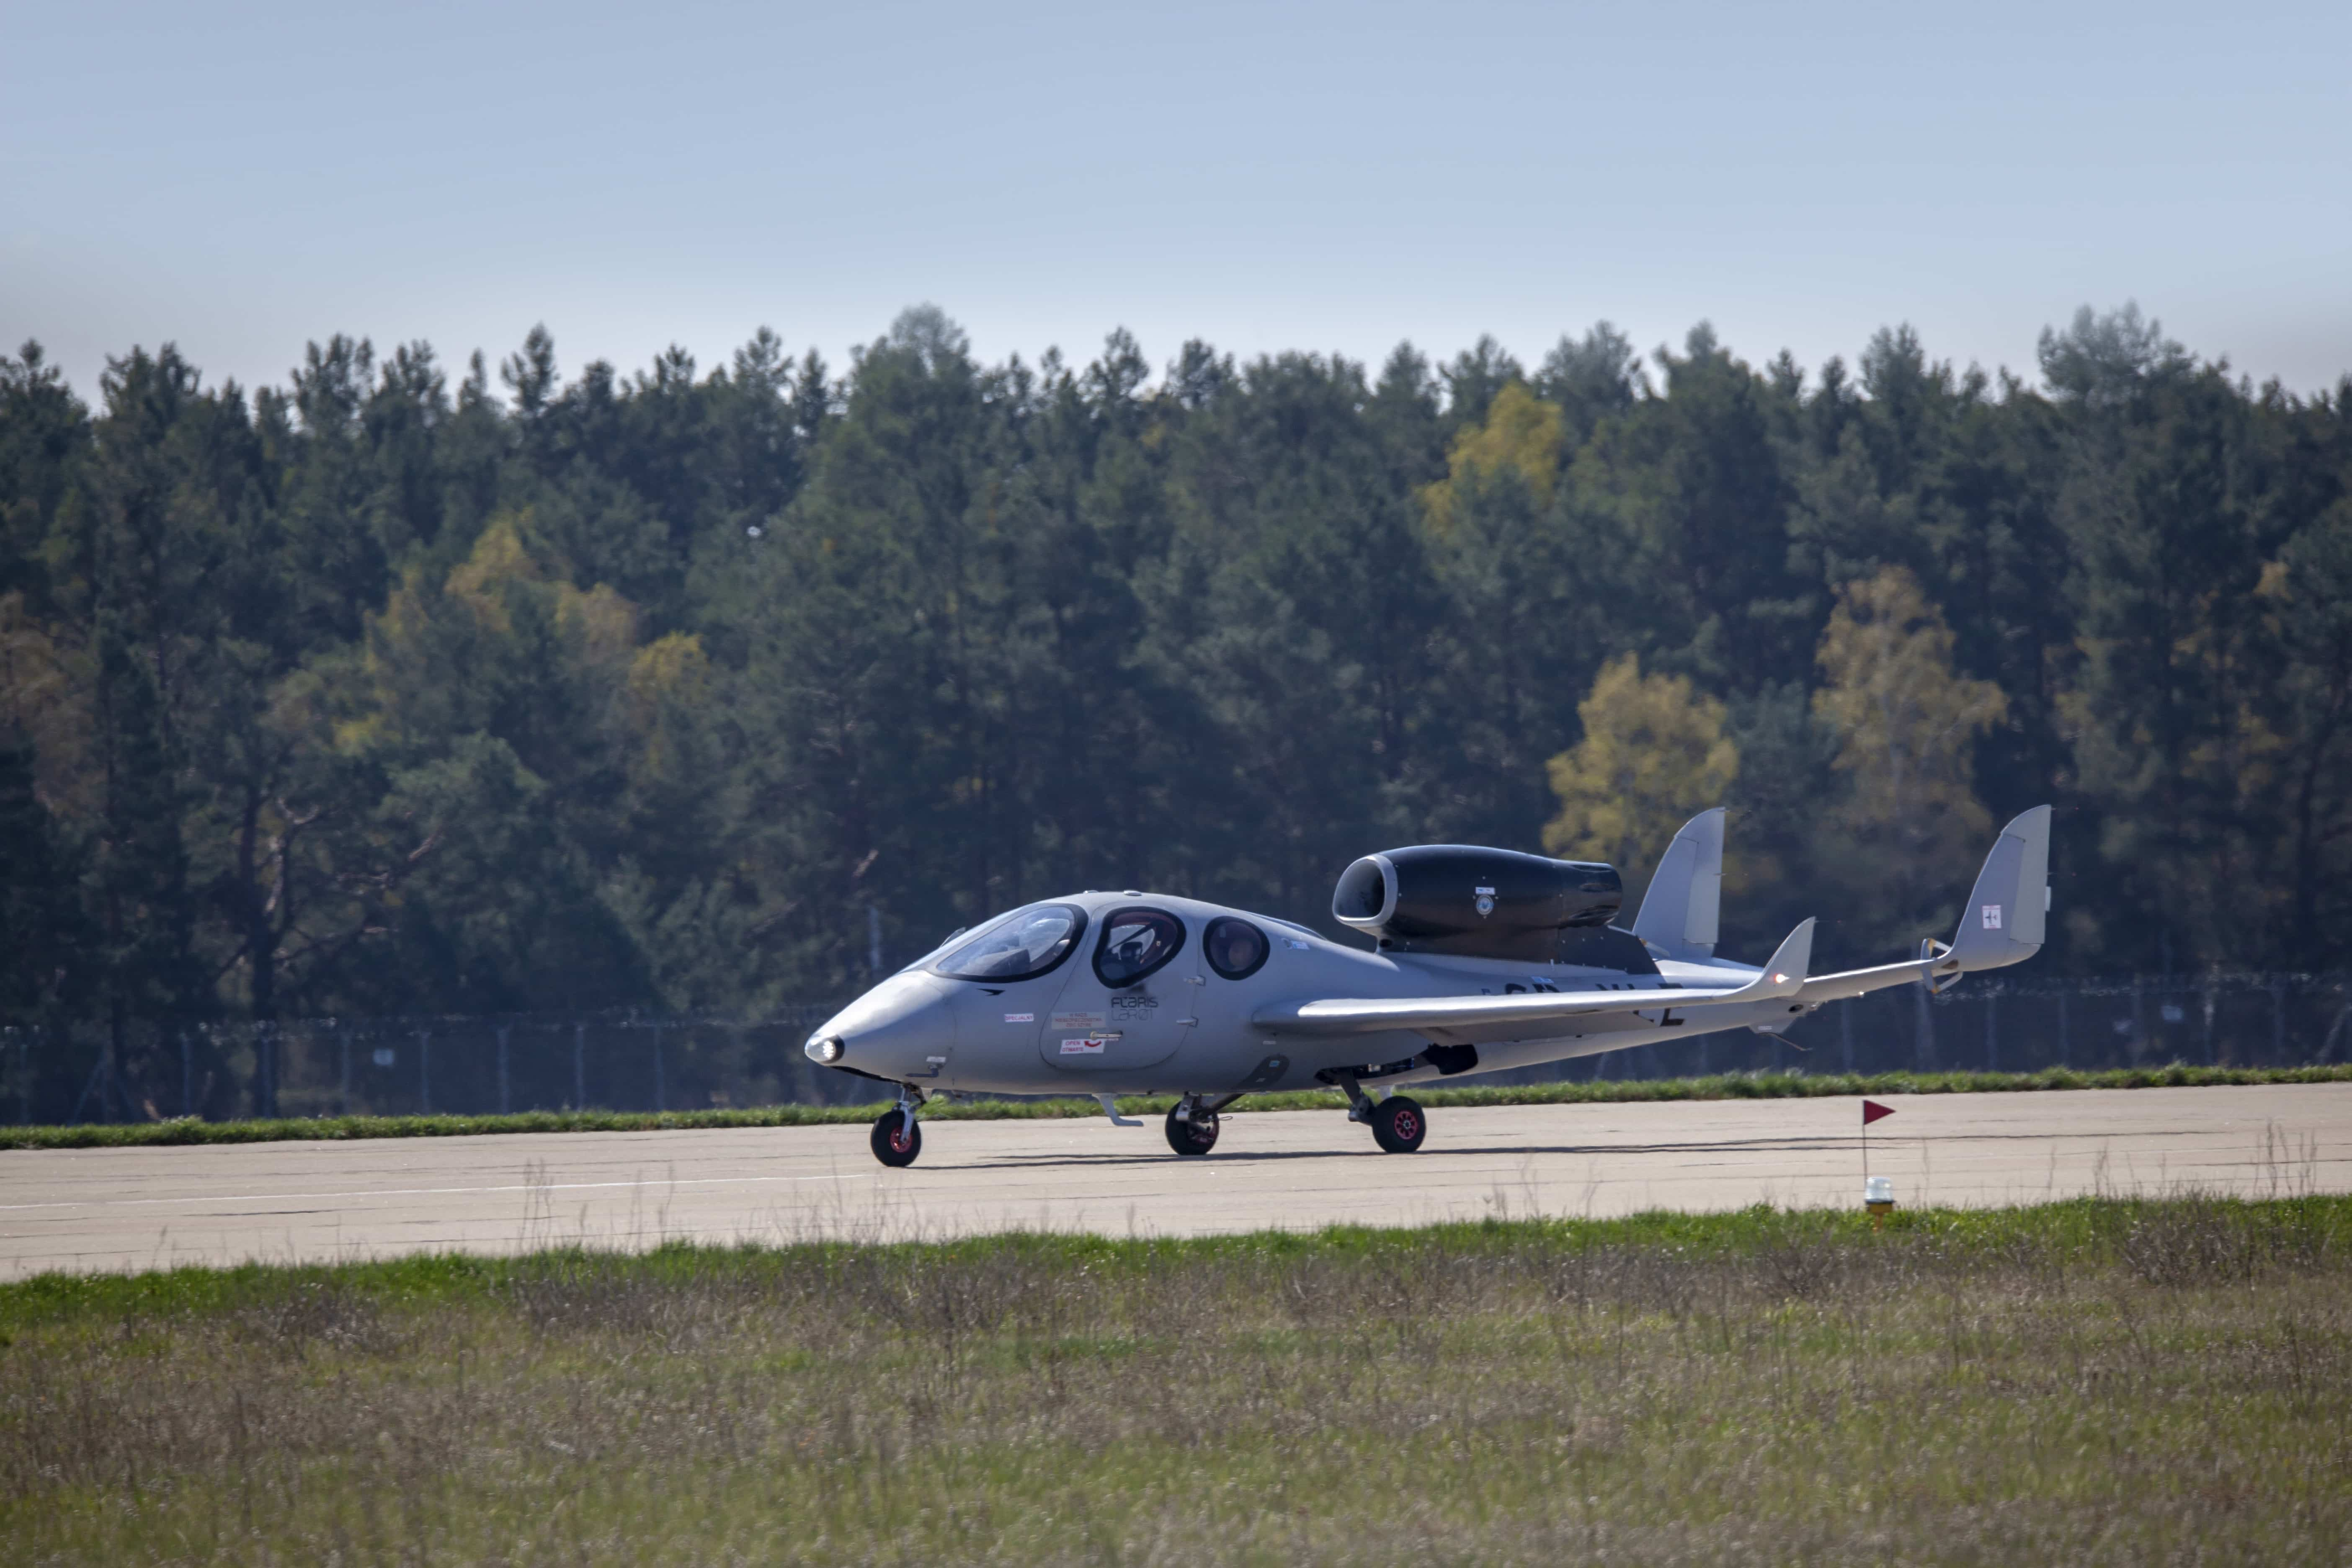 FLARIS is undergoing flight tests